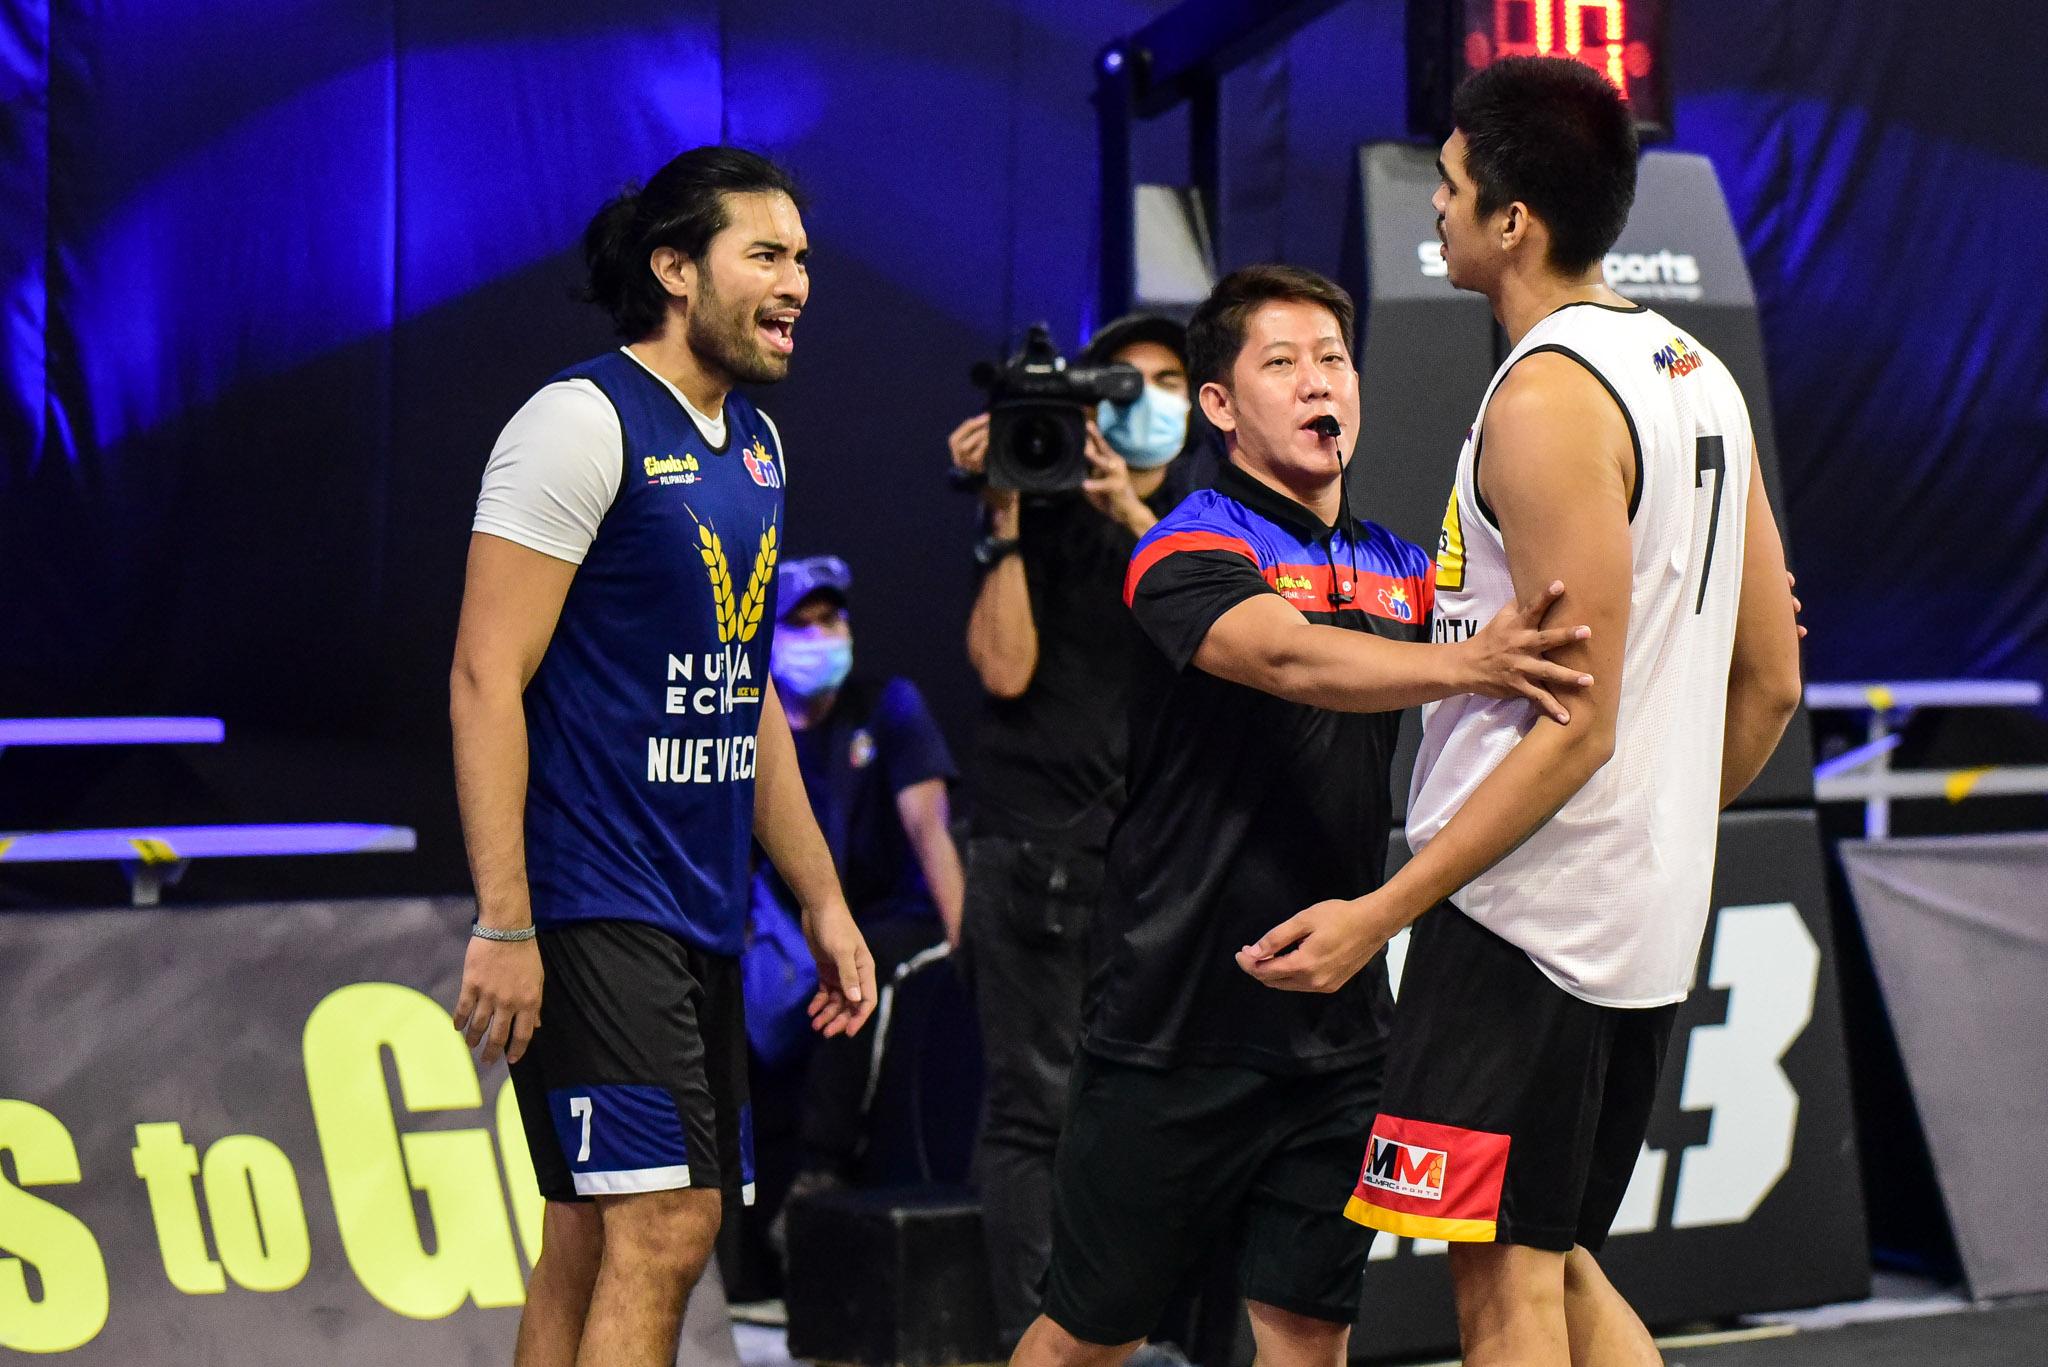 1-Chooks-to-Go-Pilipinas-3X3-Nueva-Ecija-vs-Butuan-Scuffle-3 Franky Johnson can't wait for Butuan-Nueva Ecija rematch 3x3 Basketball Chooks-to-Go Pilipinas 3x3 News  - philippine sports news